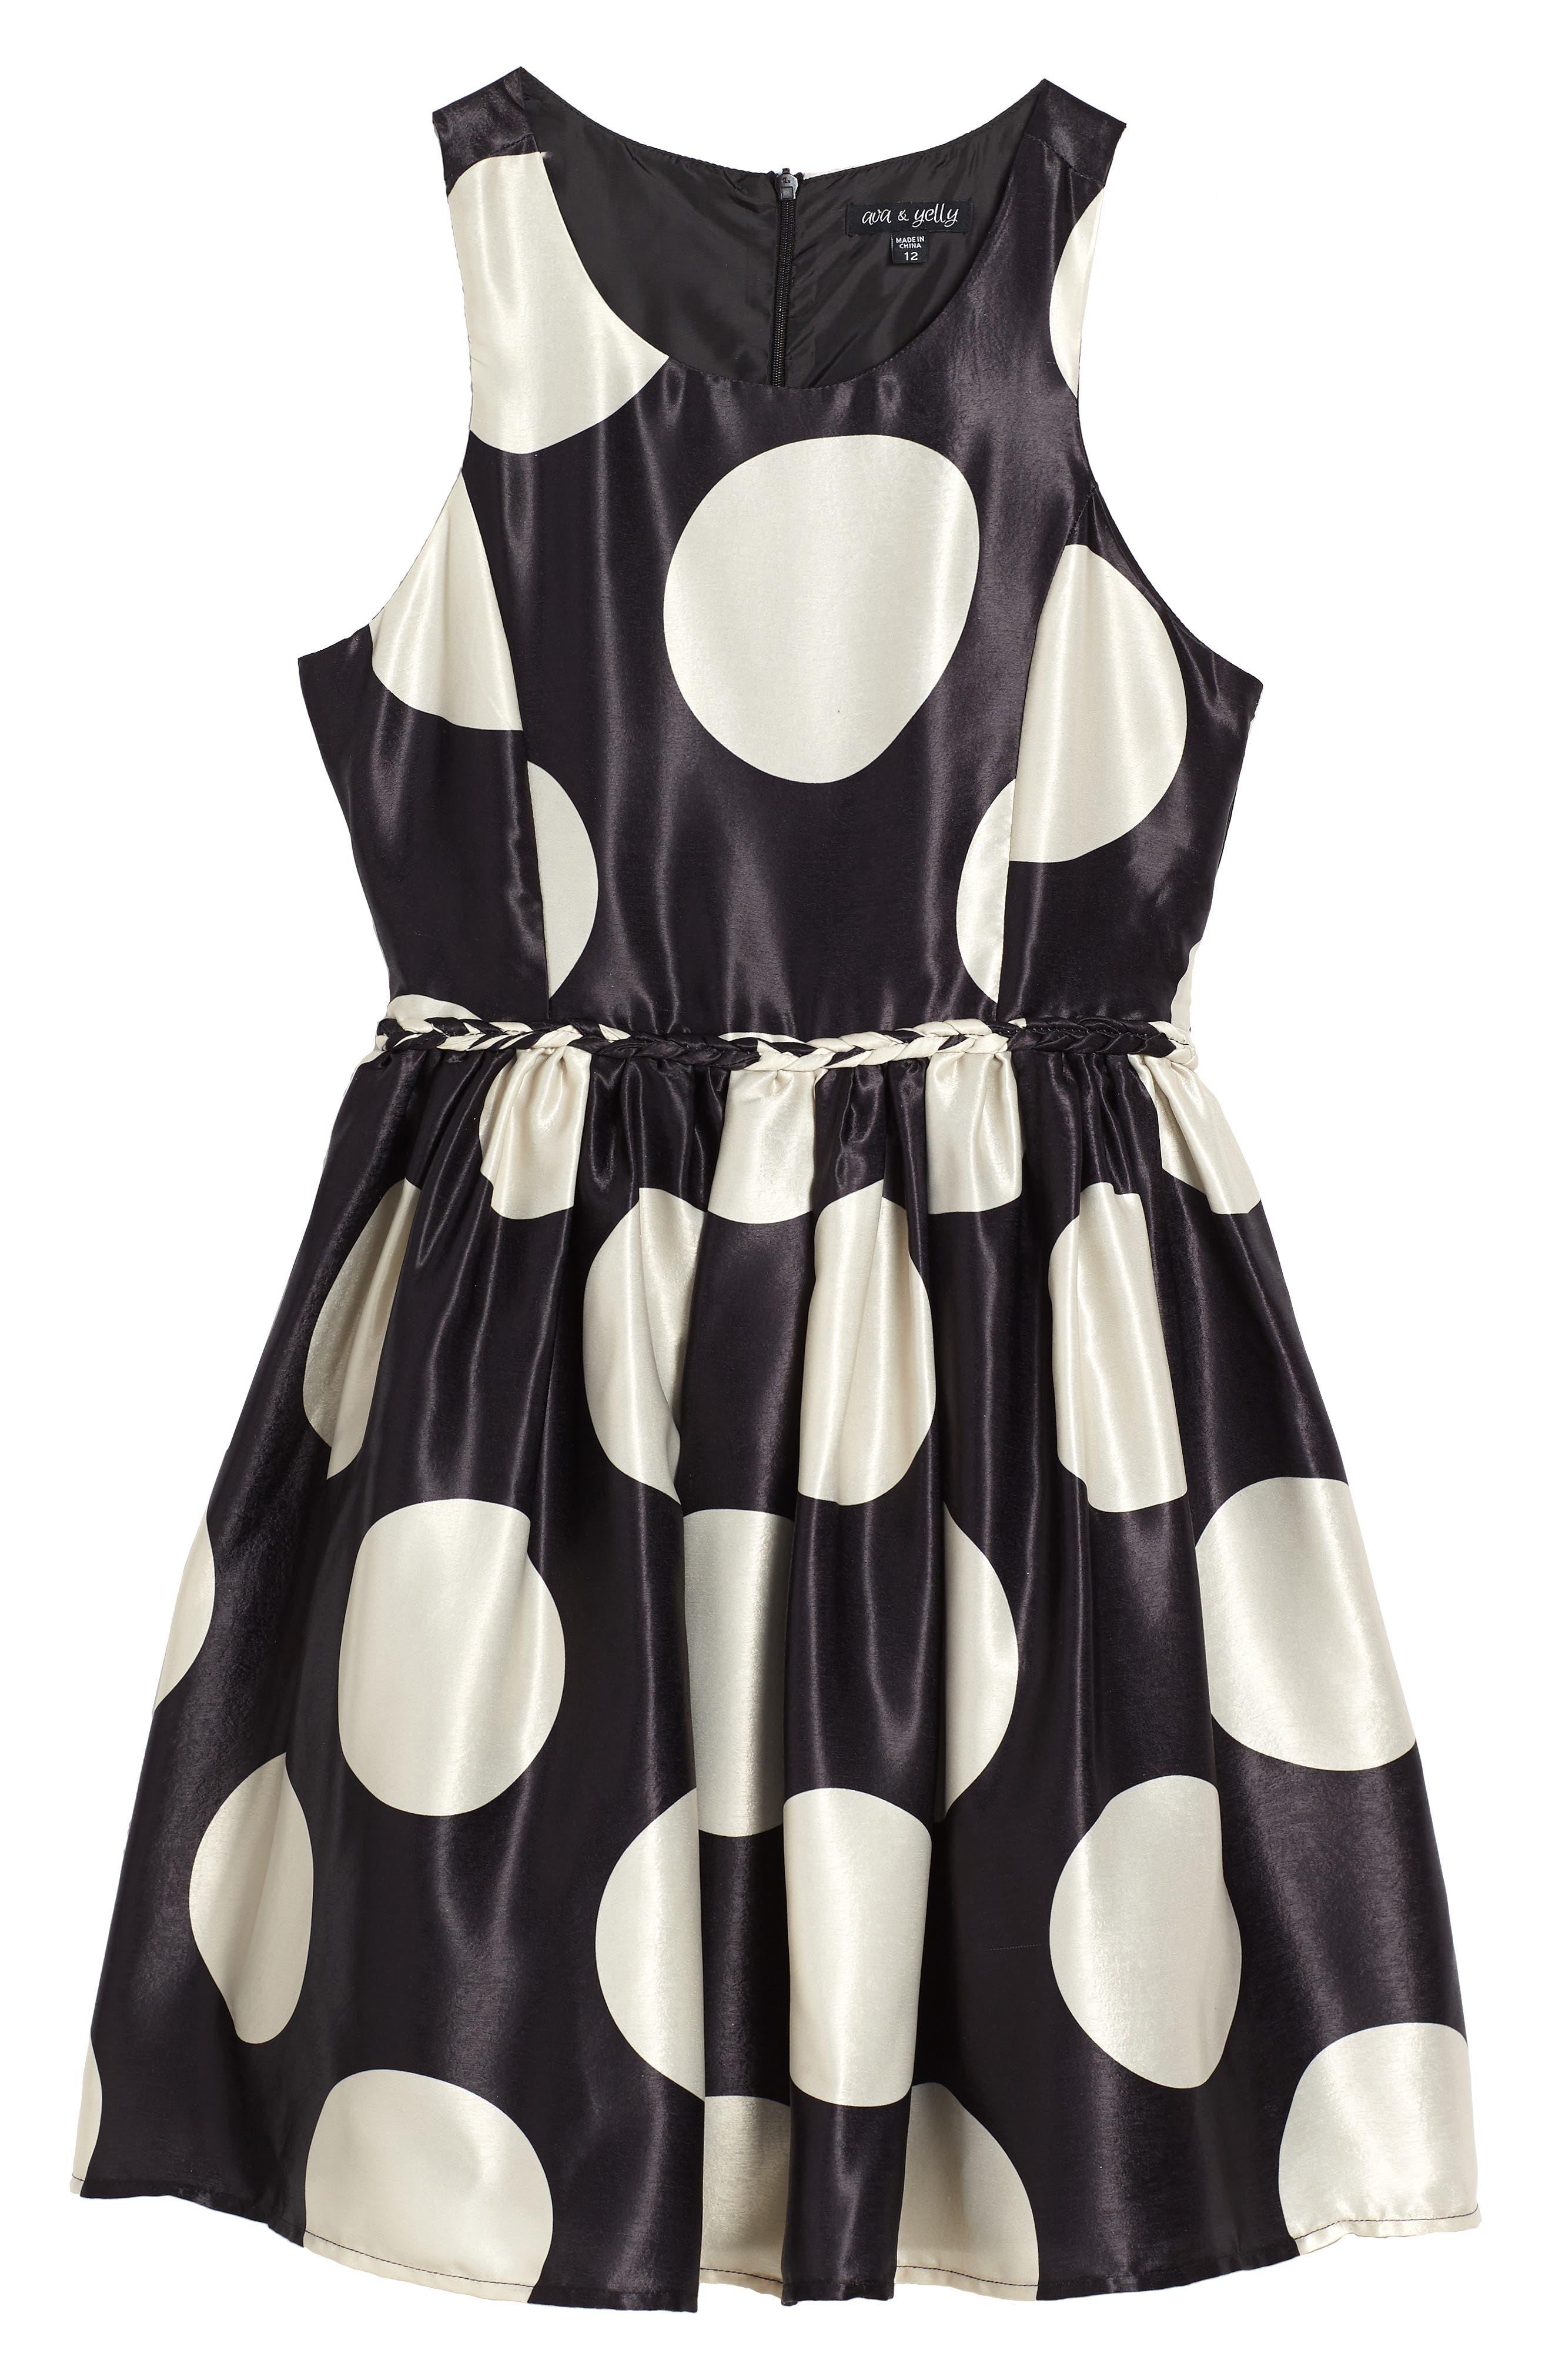 Main Image - Ava & Yelly Braided Waist Fit & Flare Dress (Big Girls)